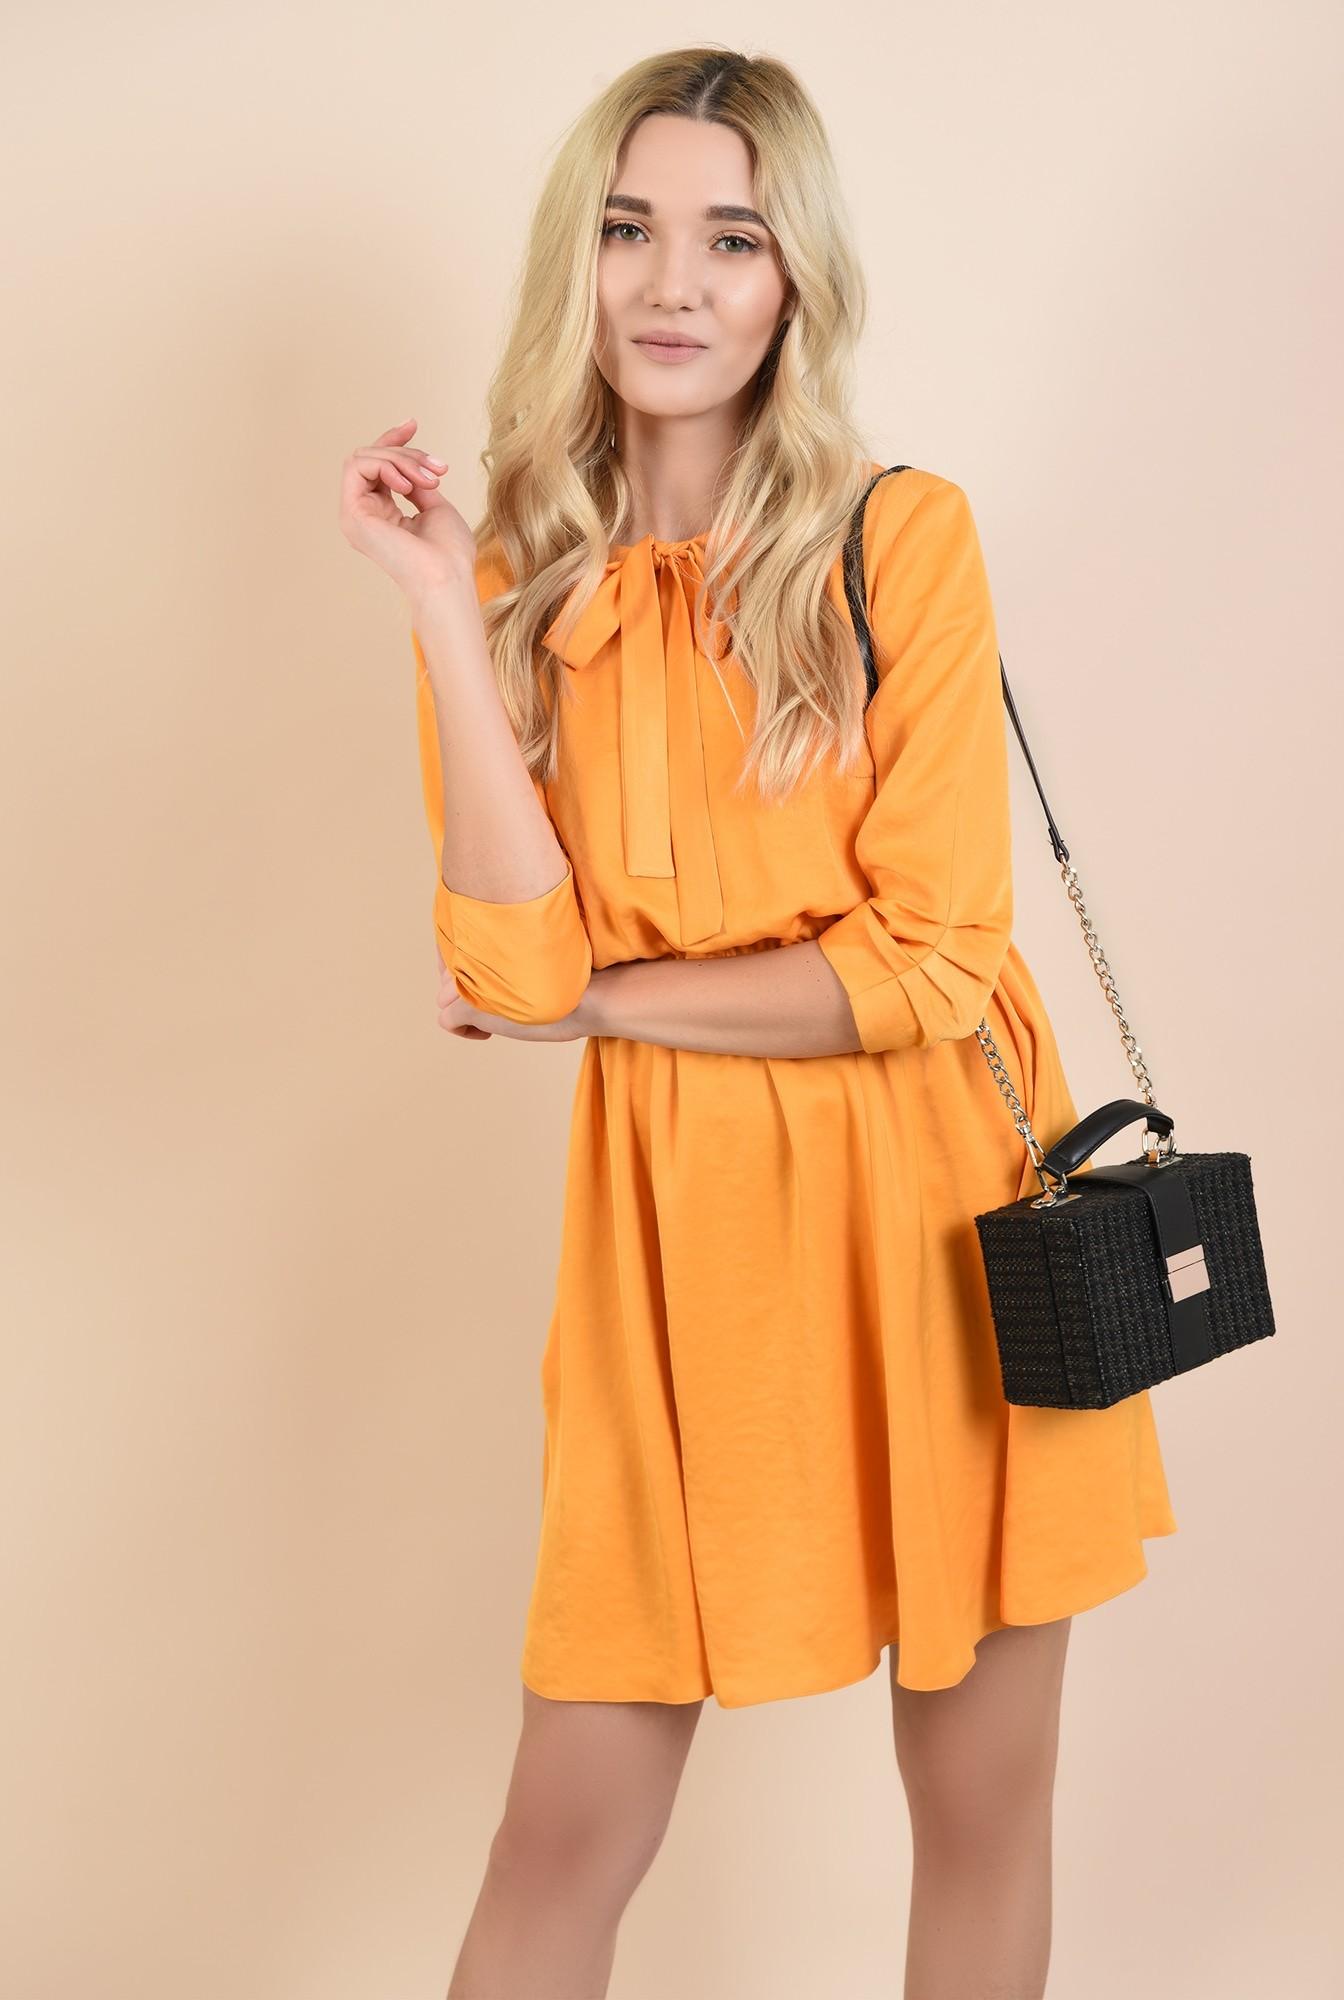 0 - rochii online, rochie mini, evazata, cu elastic la talie